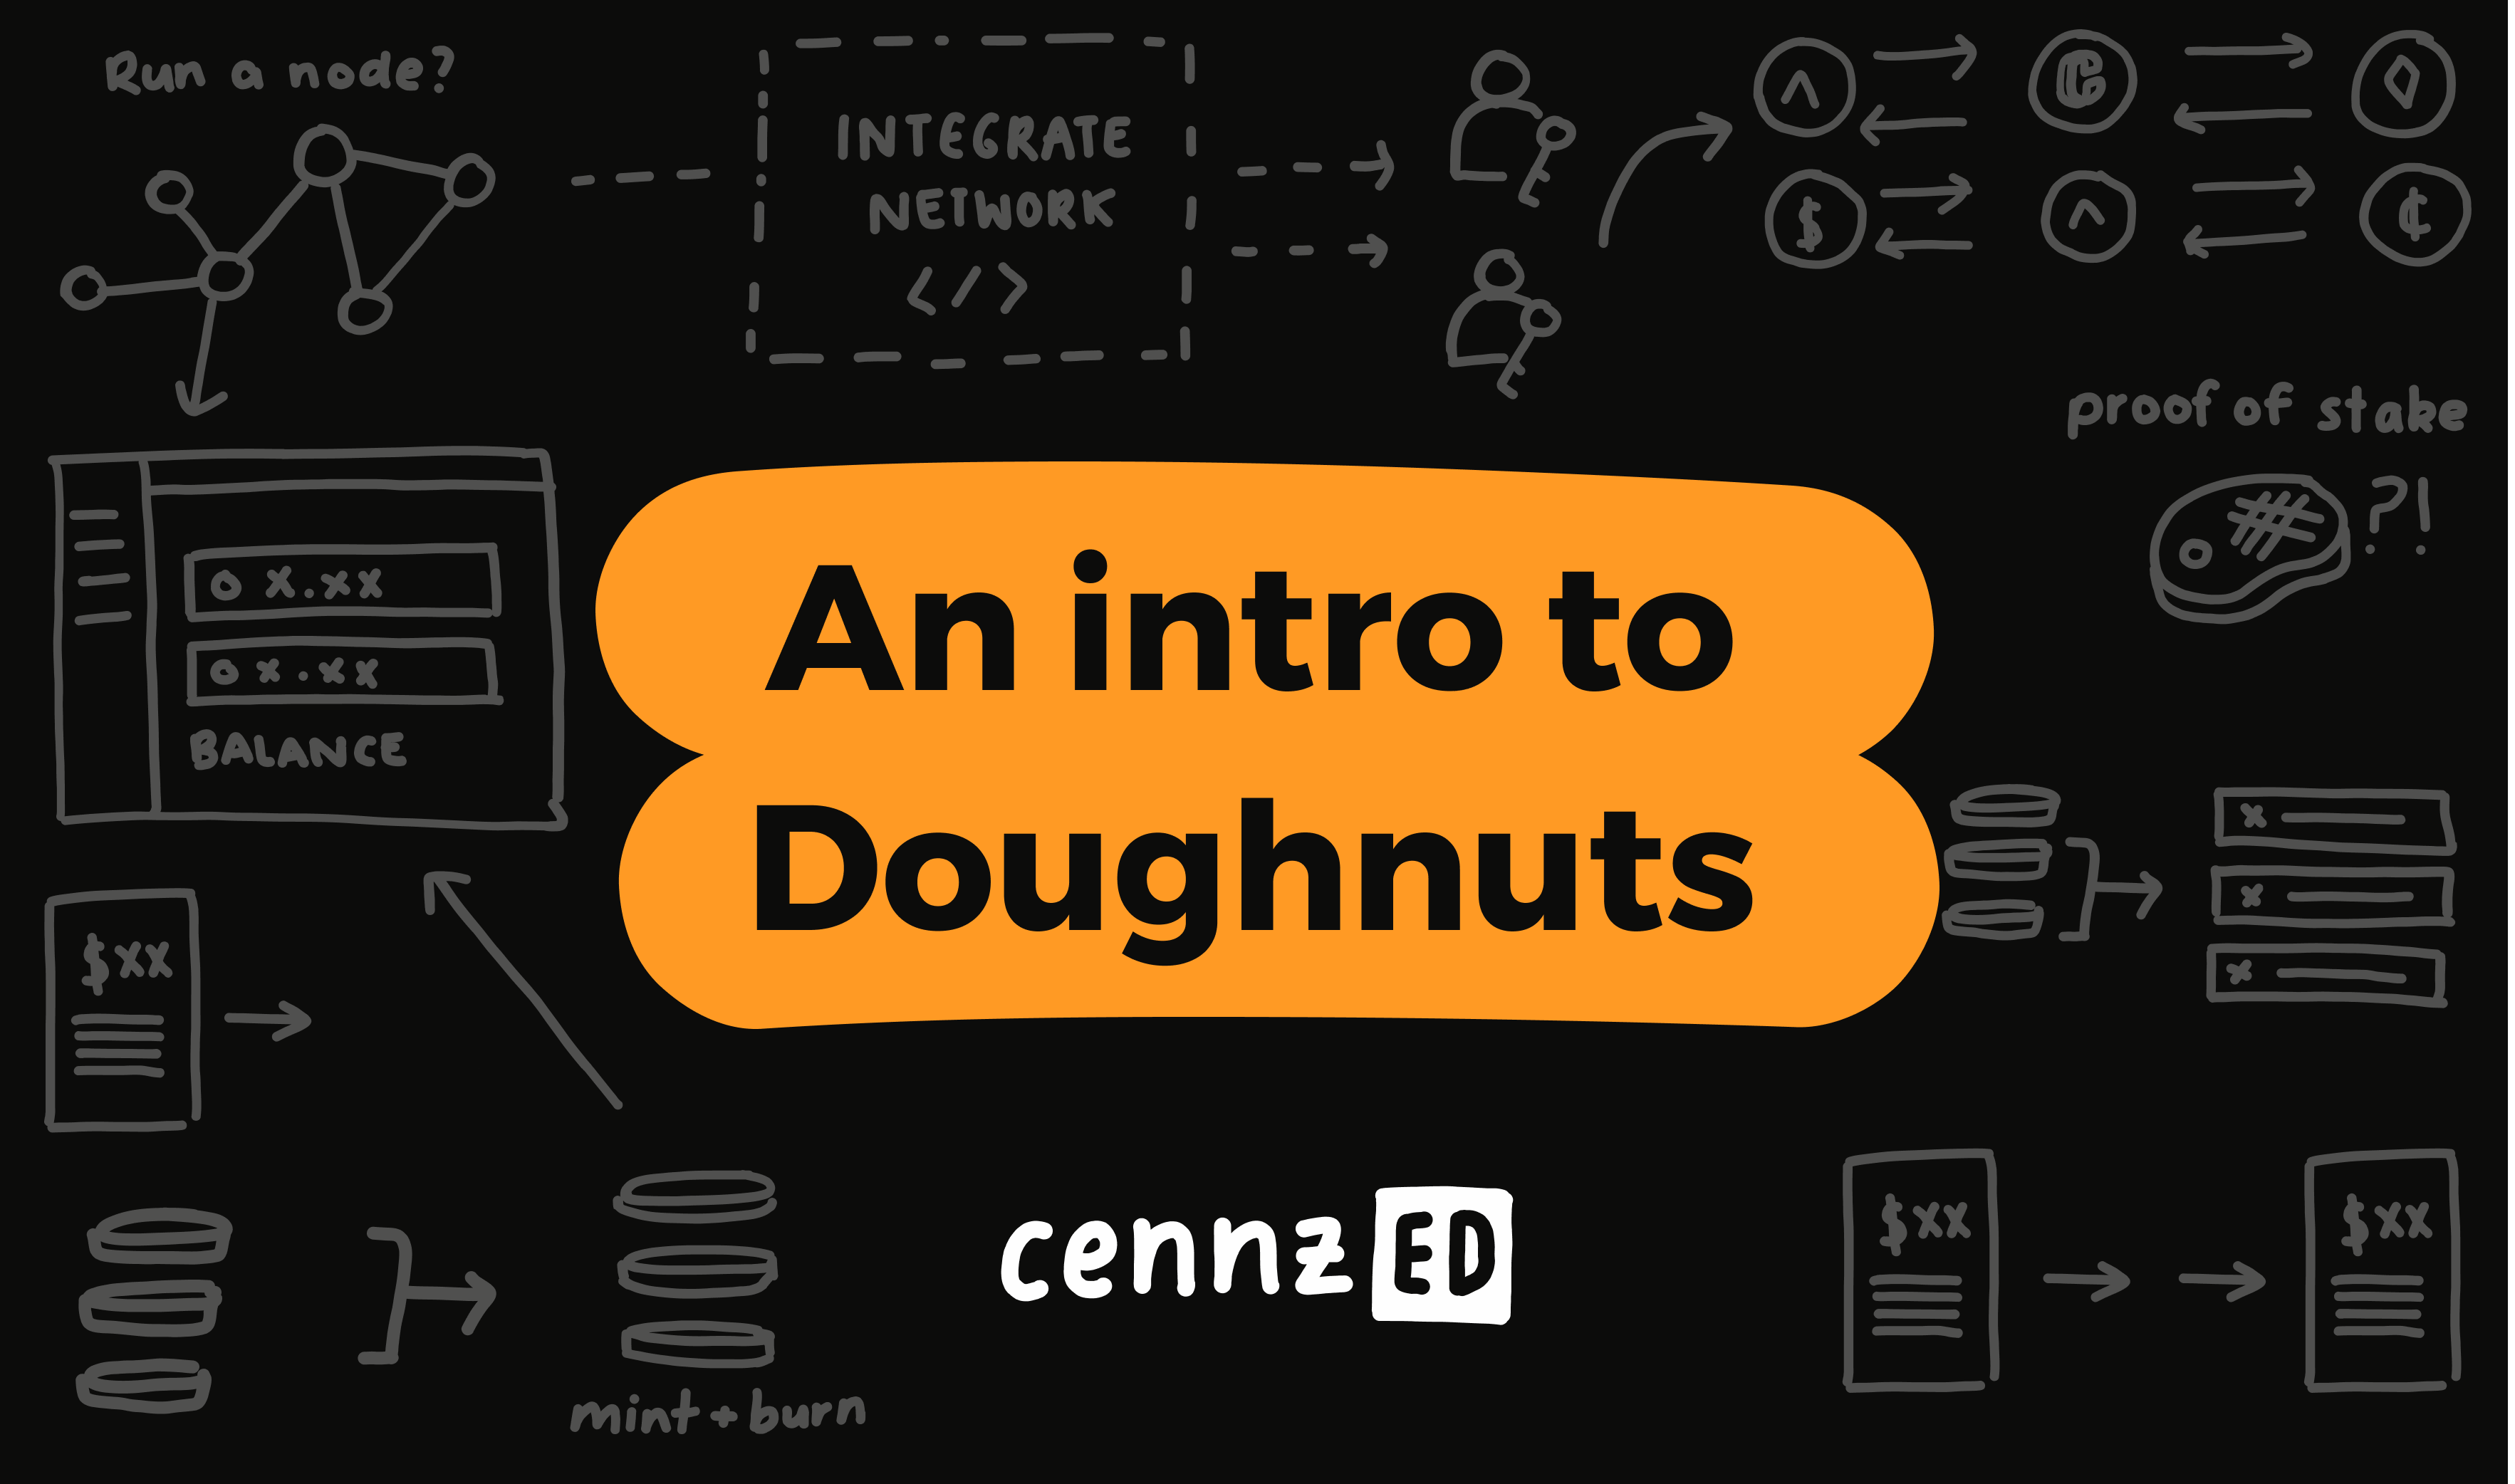 An intro to Doughnuts